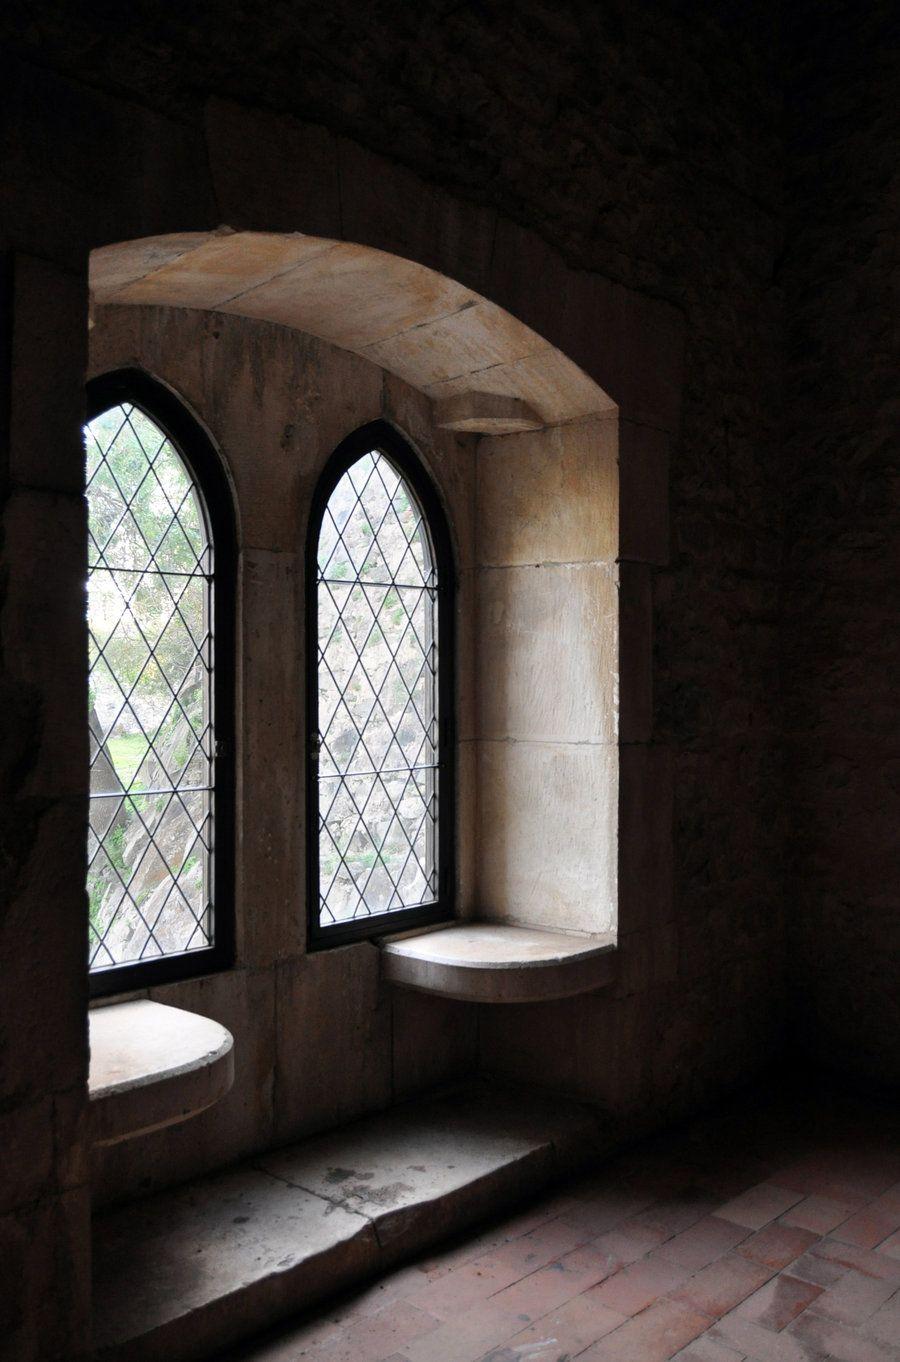 medieval castle interior window seat keys to the castle medieval castle interior window seat